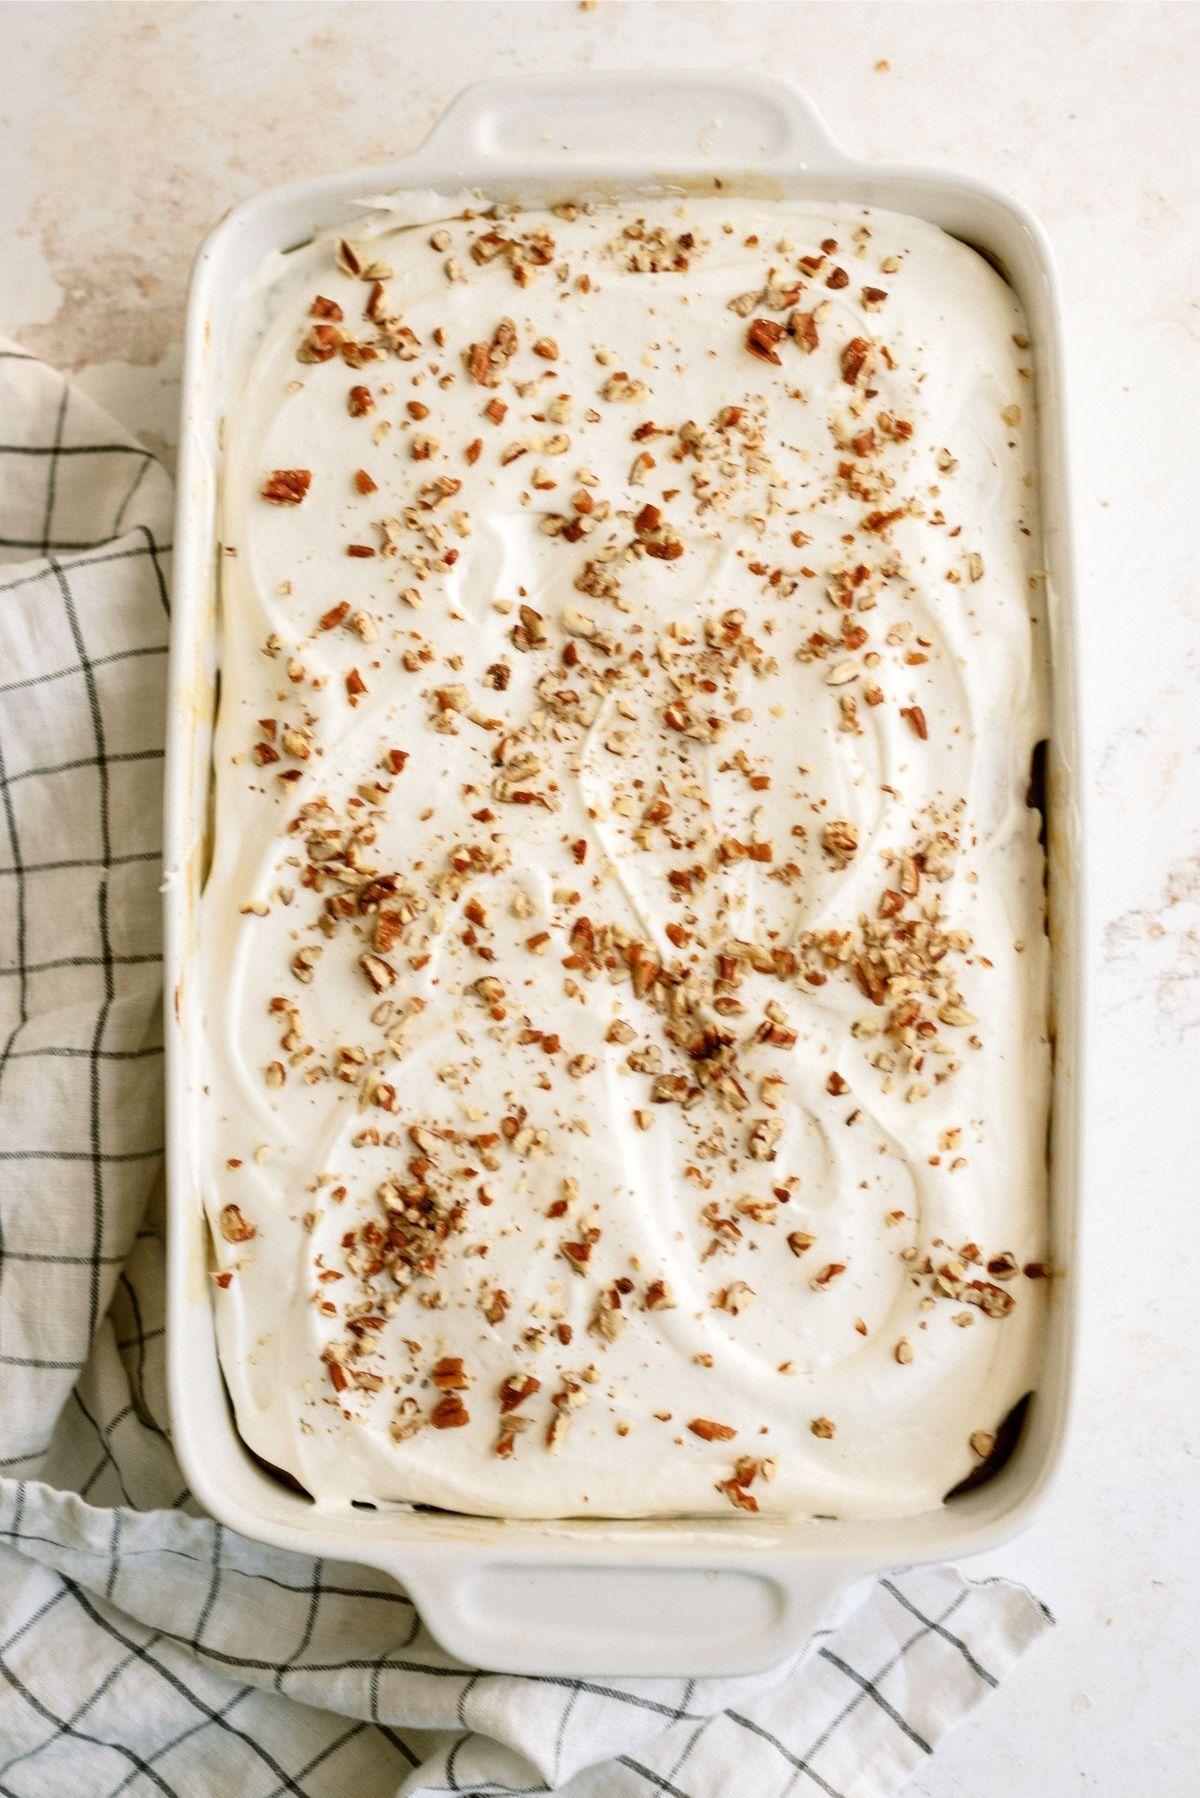 Caramel Pumpkin Poke Cake topped with chopped peacans in 9x13 pan